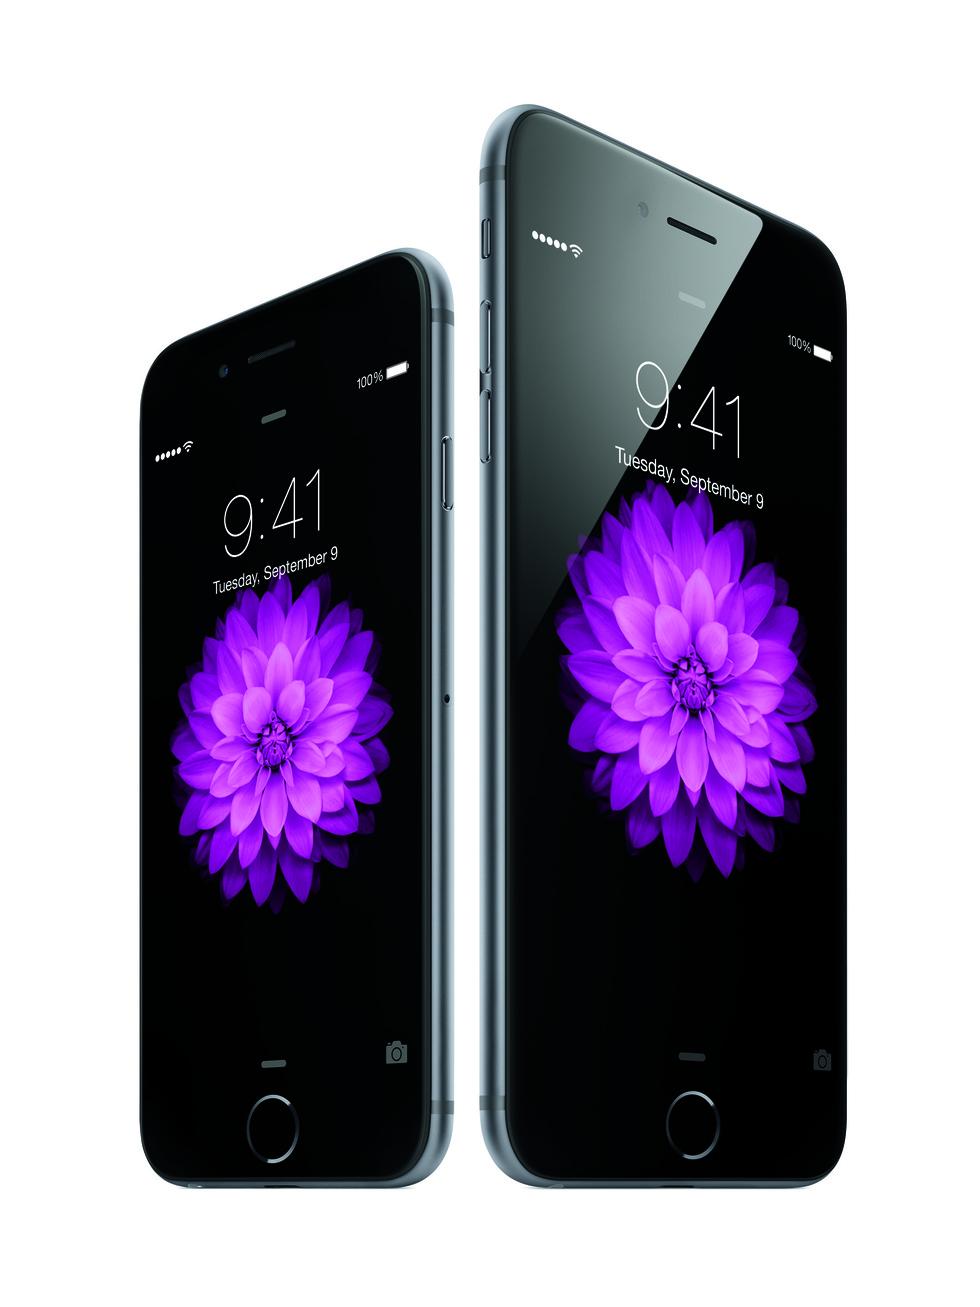 Pantalla de desbloqueo de iPhone 6 y iPhone 6 Plus